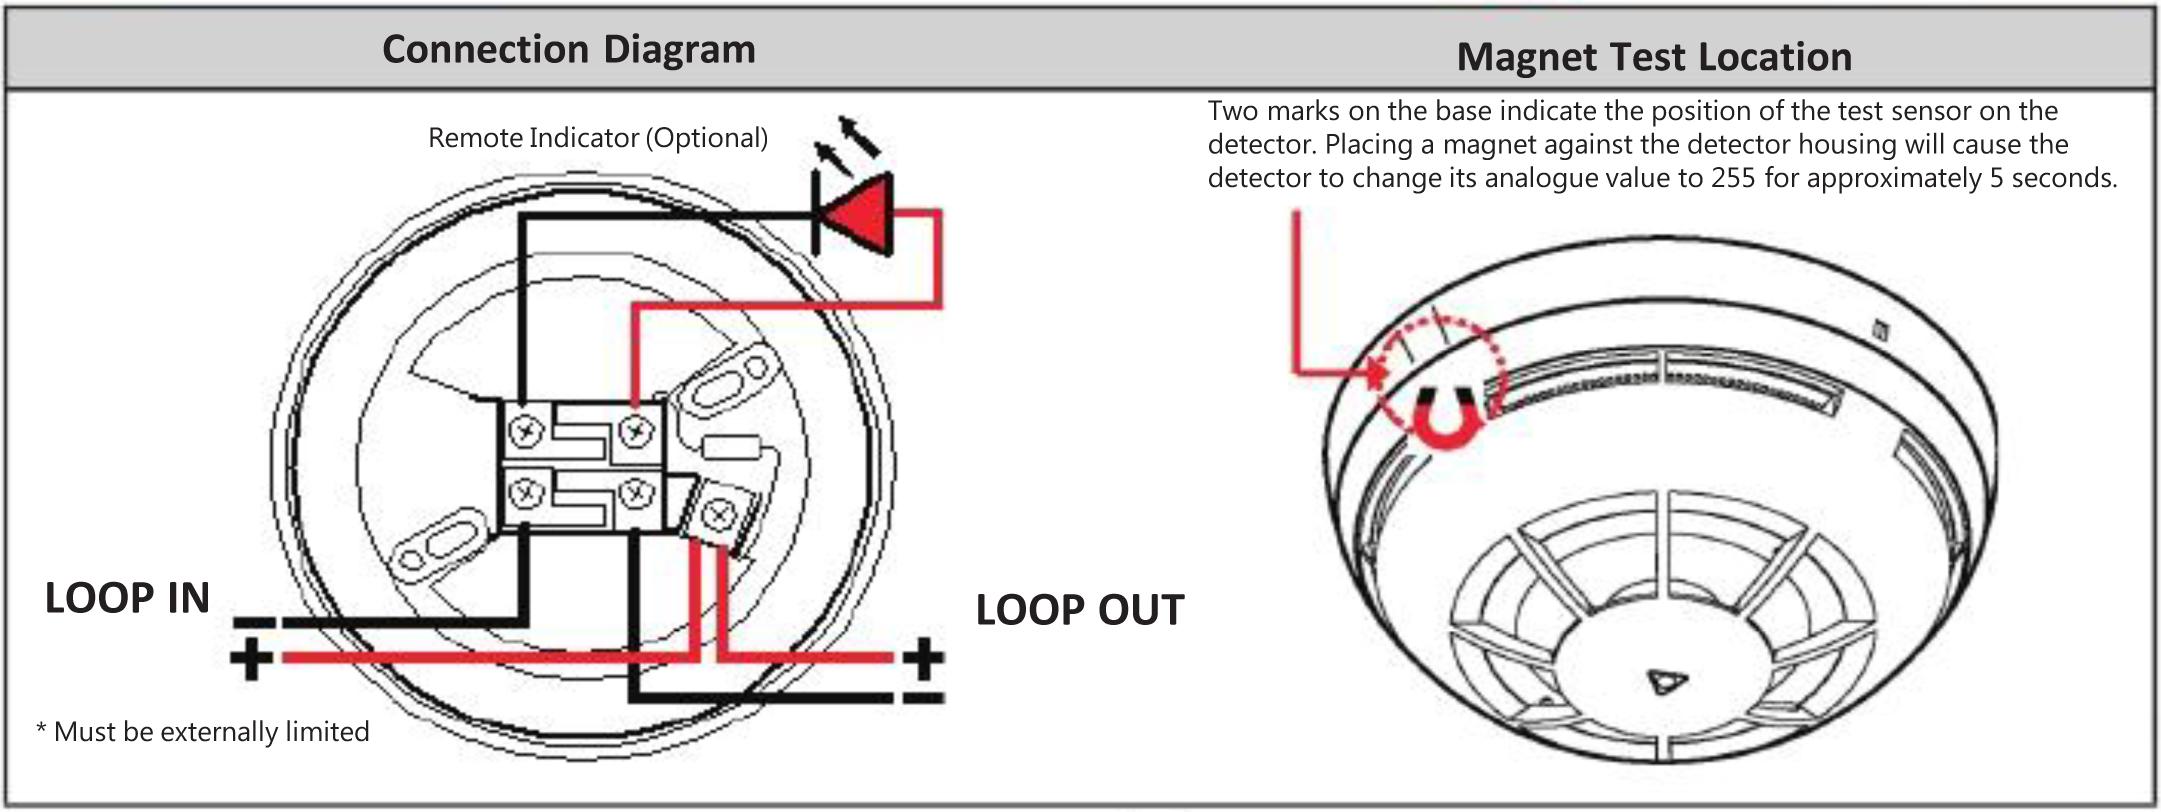 smoke detector installation diagram: wiring smoke detectors together  diagramrh:svlc us,design